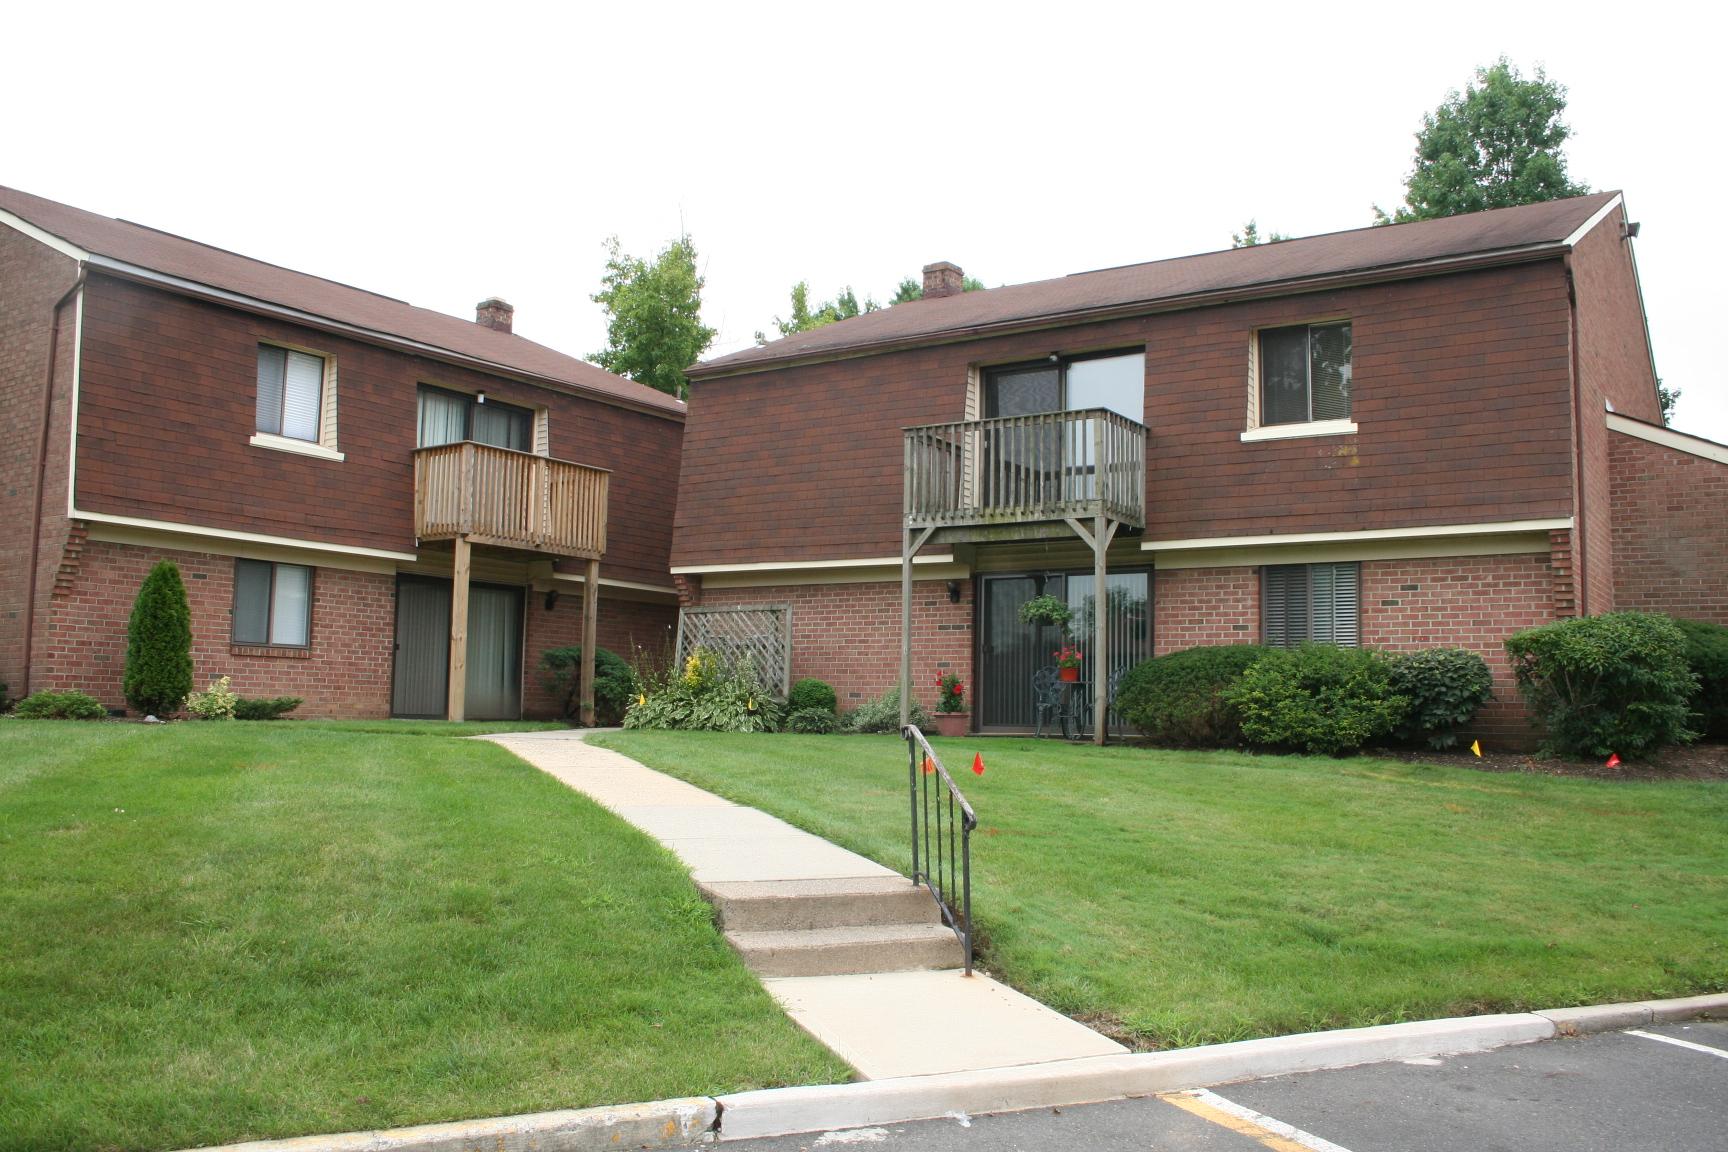 Homes For Sale In Woodmont Lawrenceville Nj